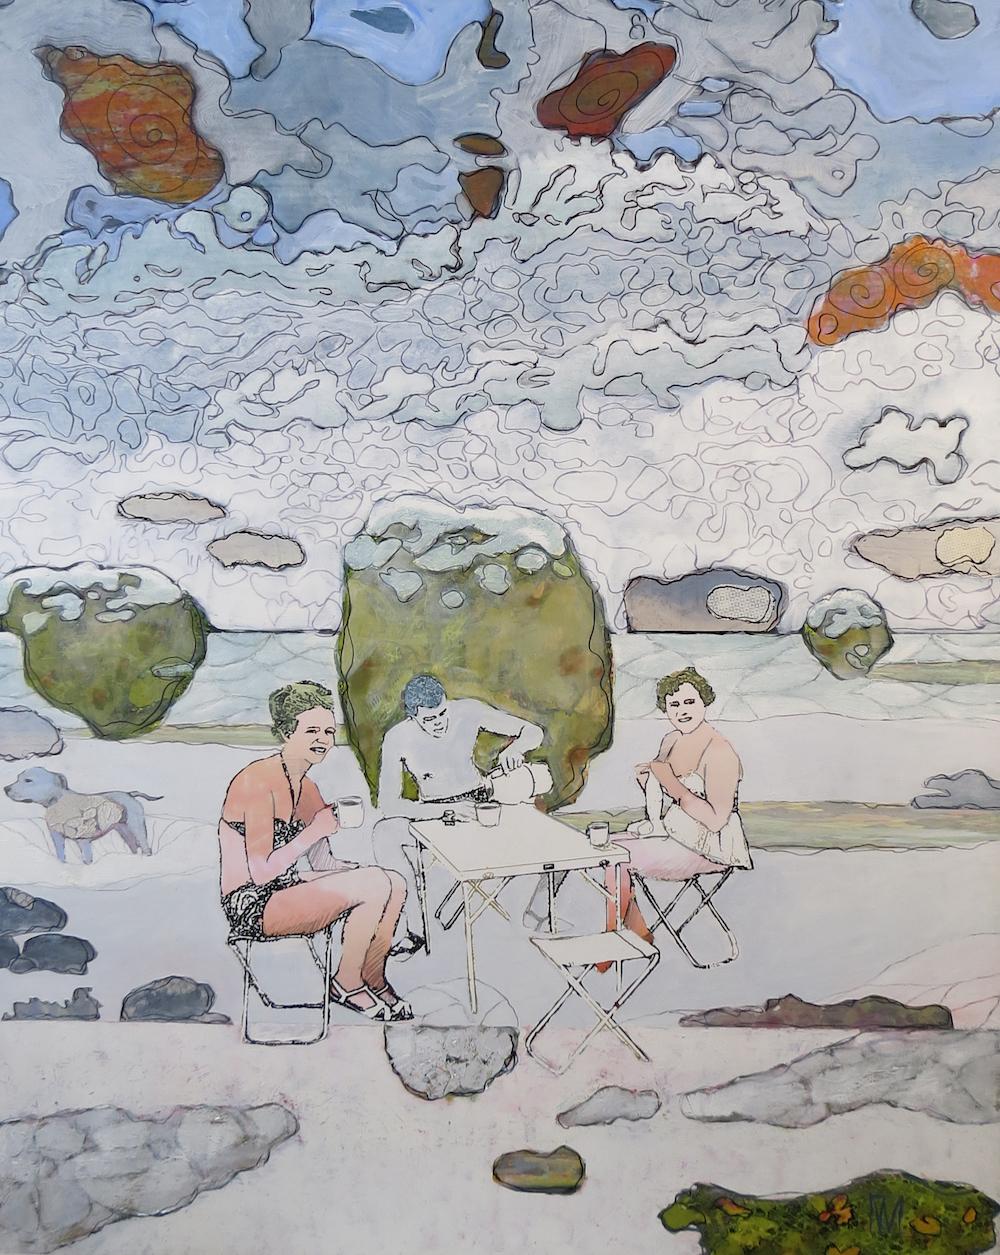 Urban Wikberg Mixed media|Fine Art Print på canvas och måleri 80 x 100 cm 18 000 kr urbanwikberg.se